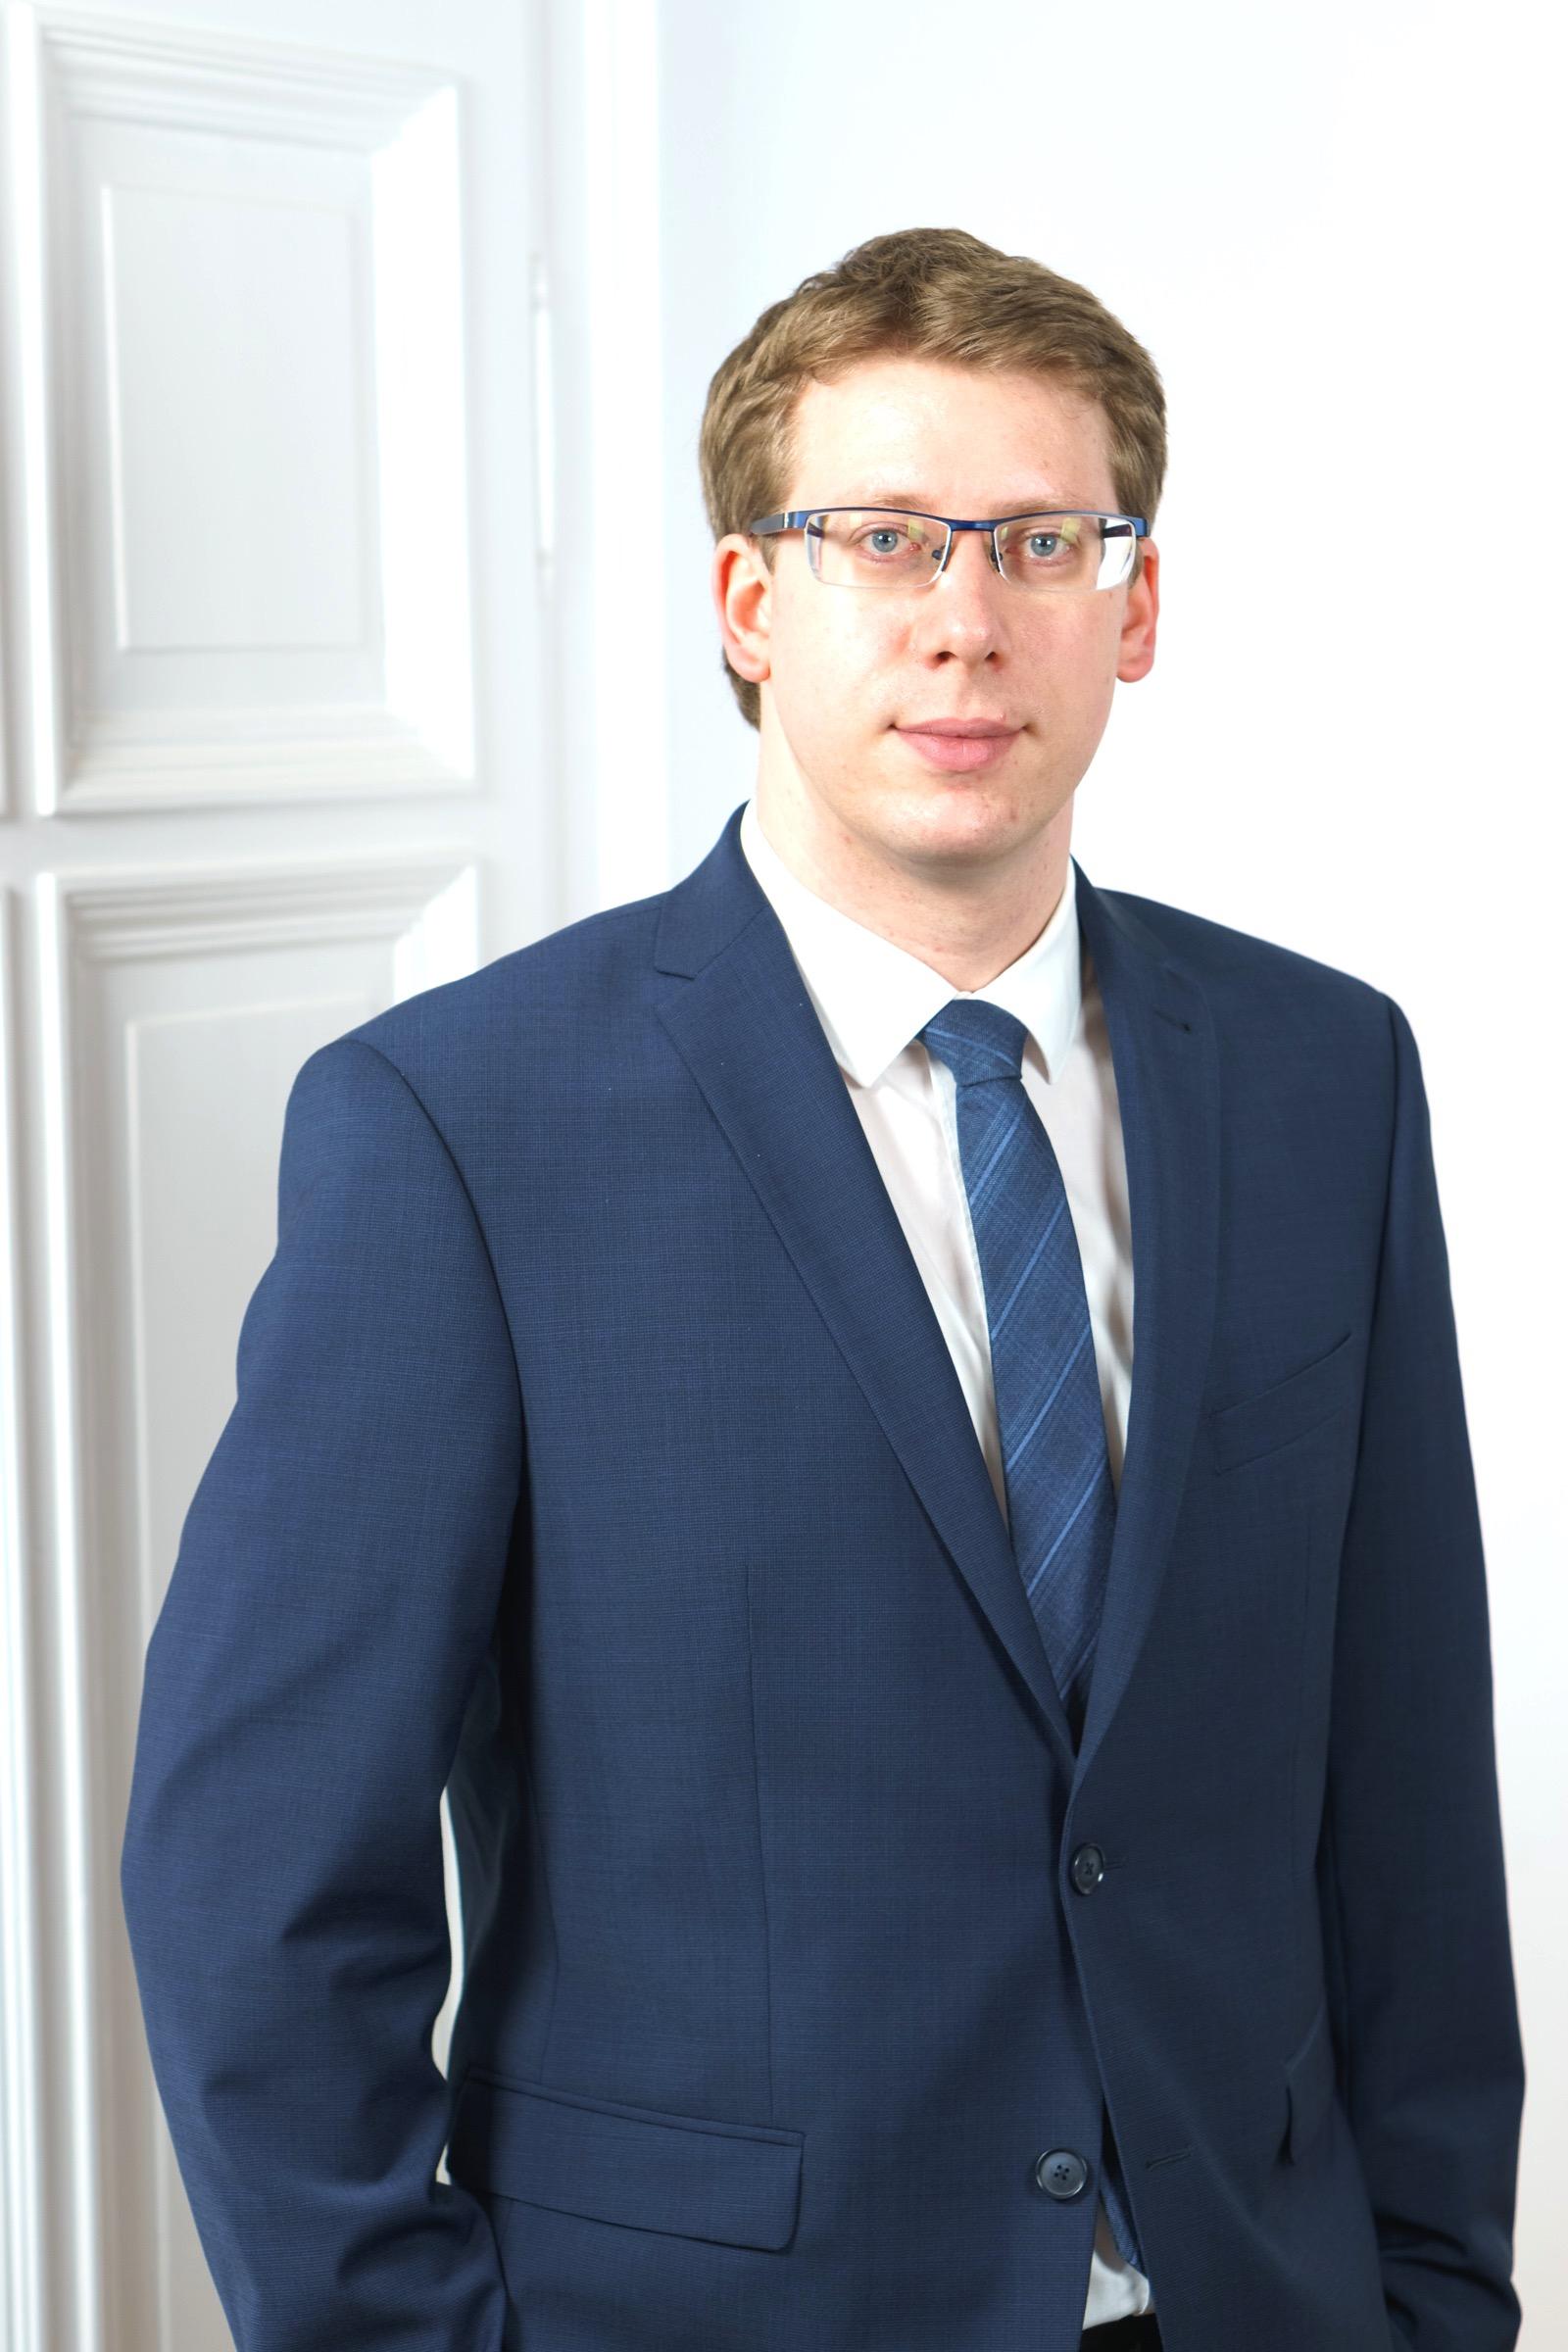 Thorsten Lachmannn